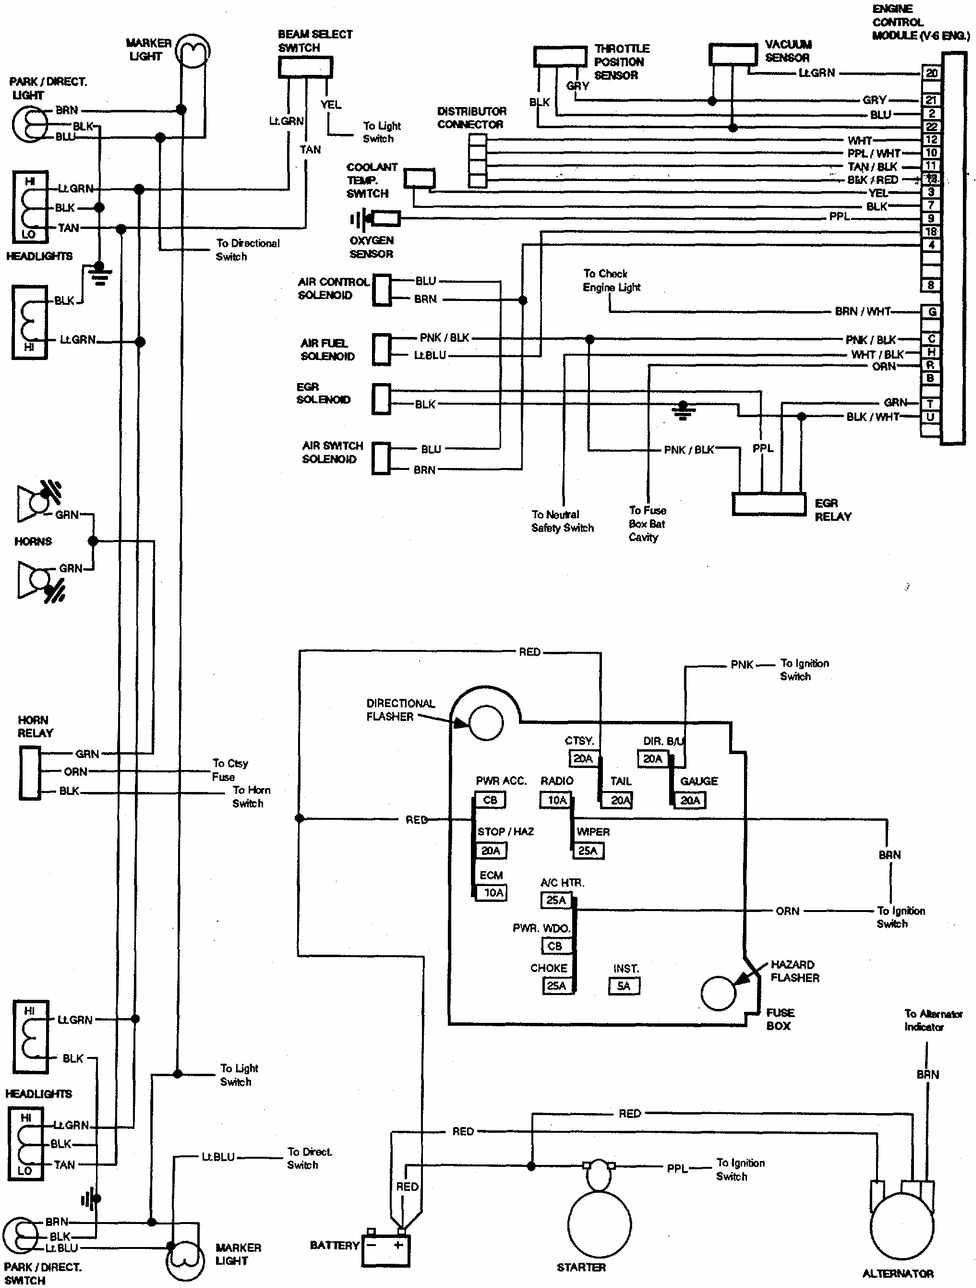 Chevrolet+V8+Trucks+1981 1987+Electrical+Wiring+Diagram?resize\\\\\\\=665%2C878 heil 7000 wiring diagram free staruml tutorial sequence diagram